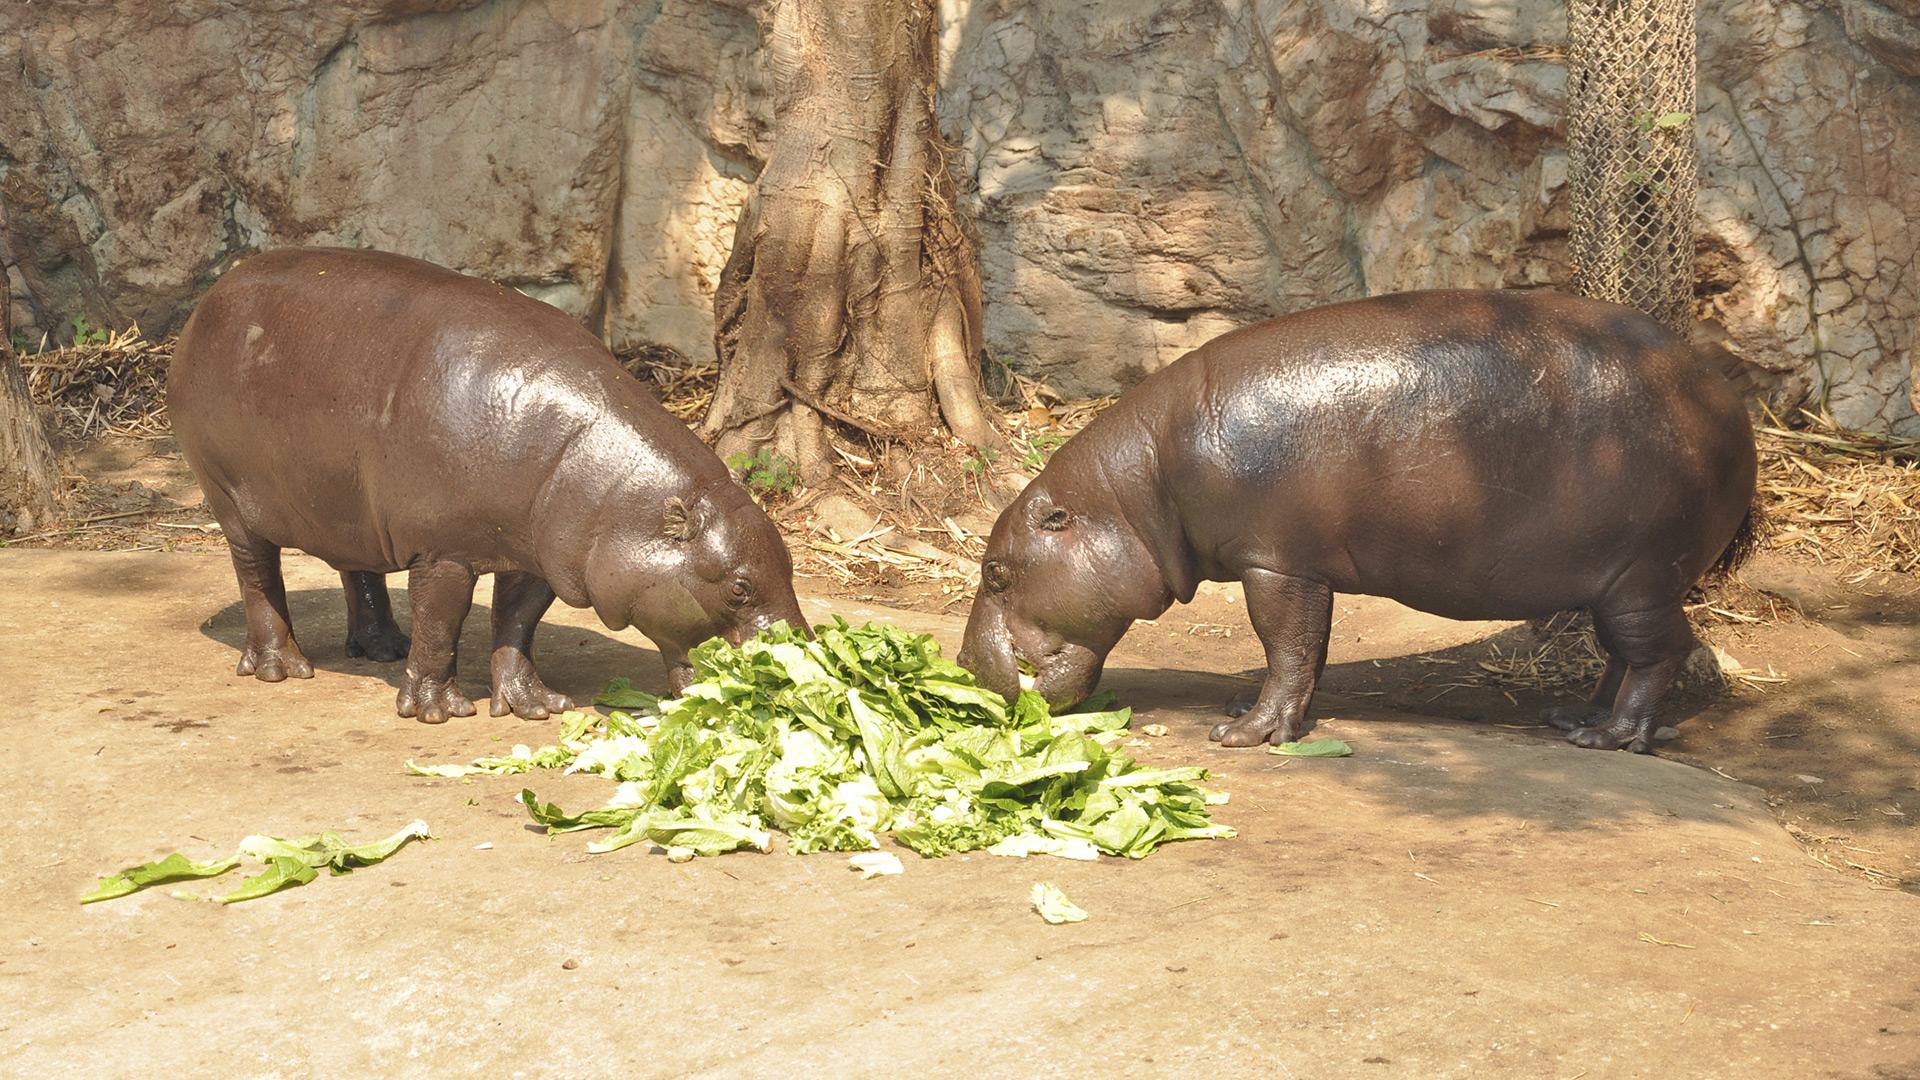 Pygmy hippos | Sheknows.com